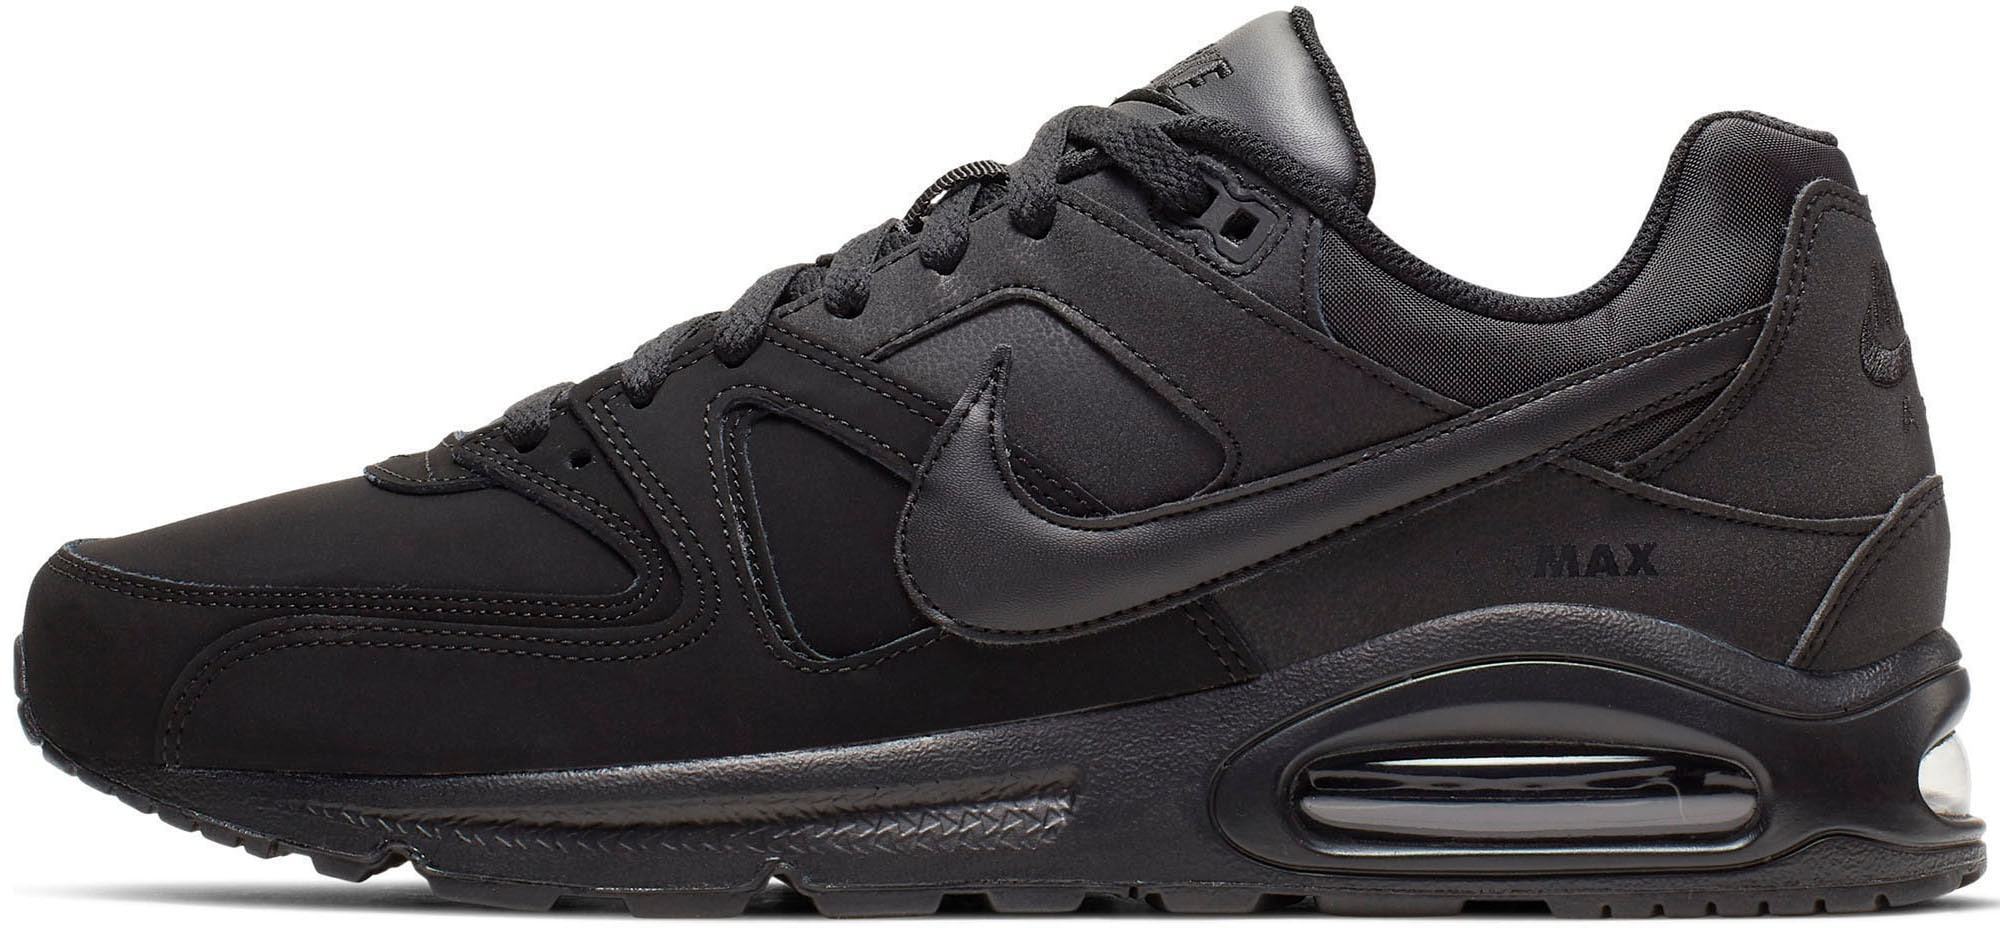 Nike Sportswear Sneaker Air Max Command Leather